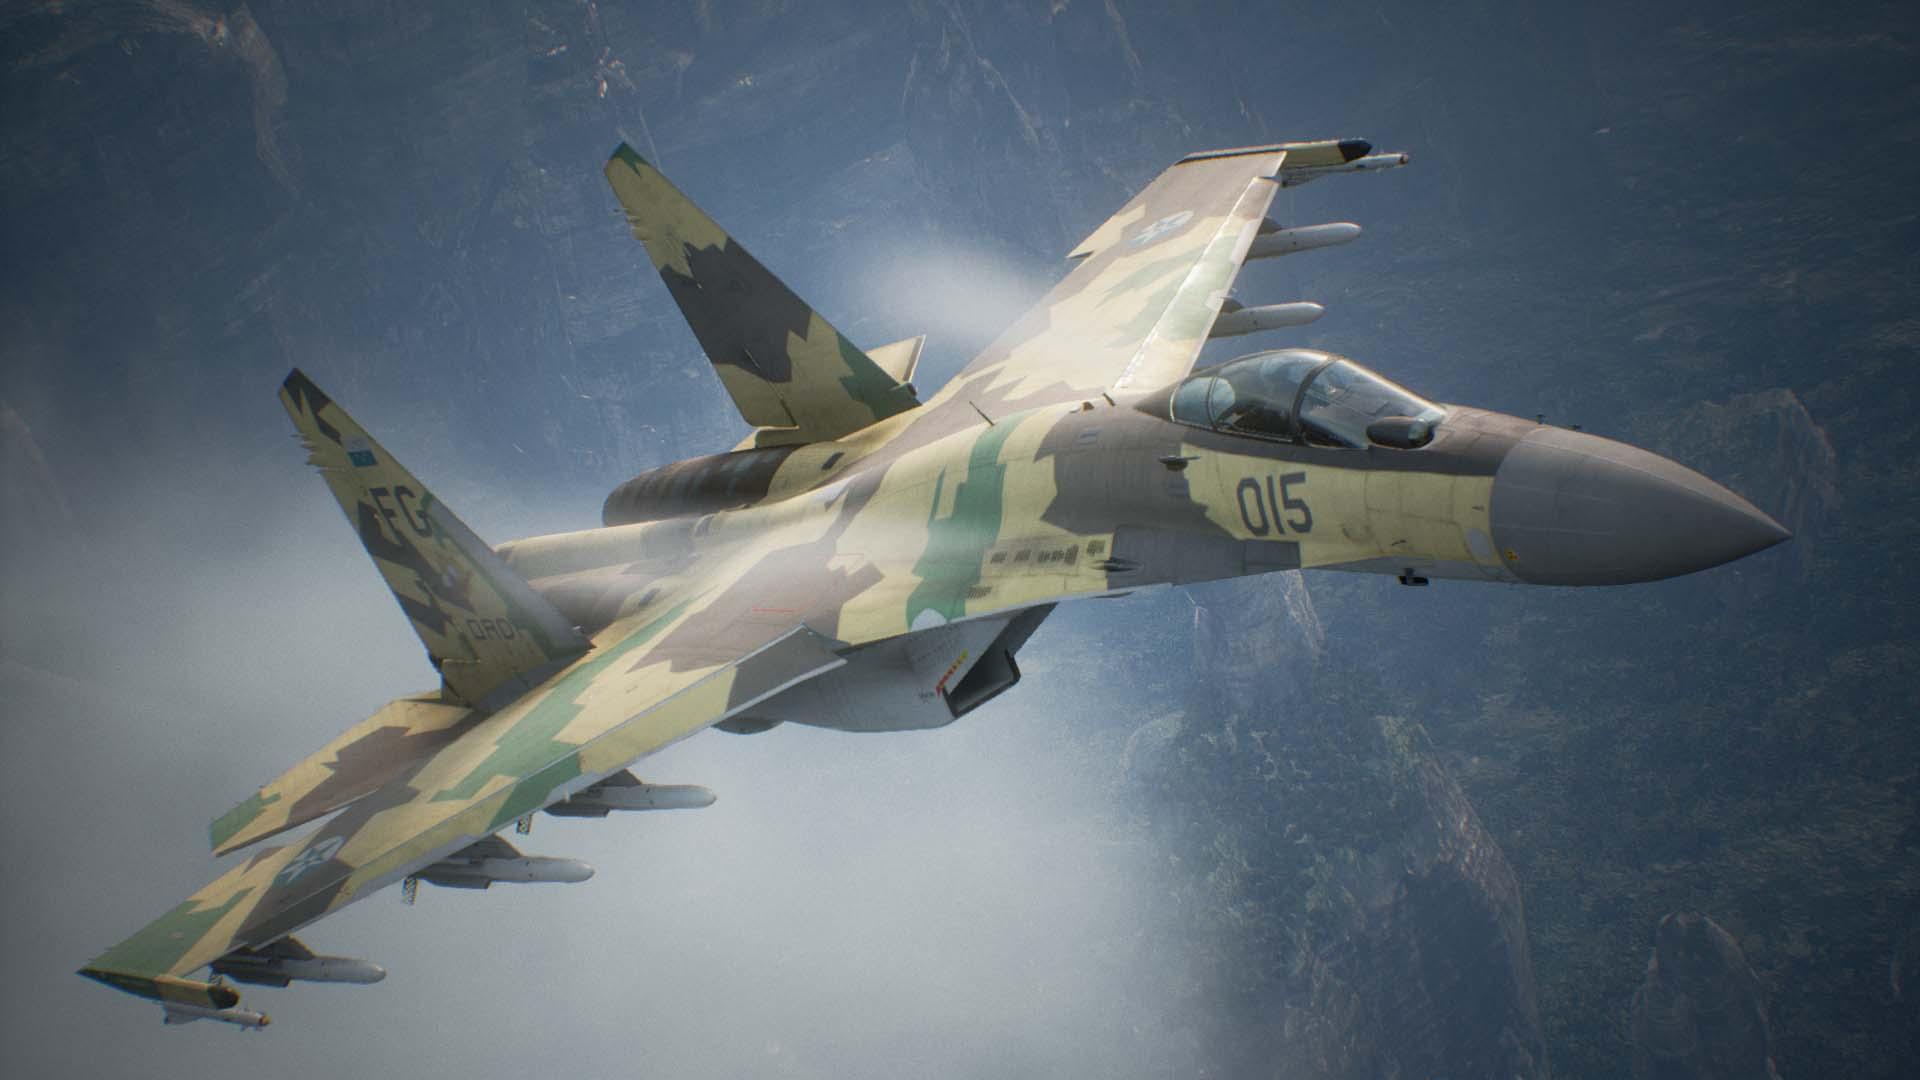 ace-combat-7-08-22-17-23.jpg